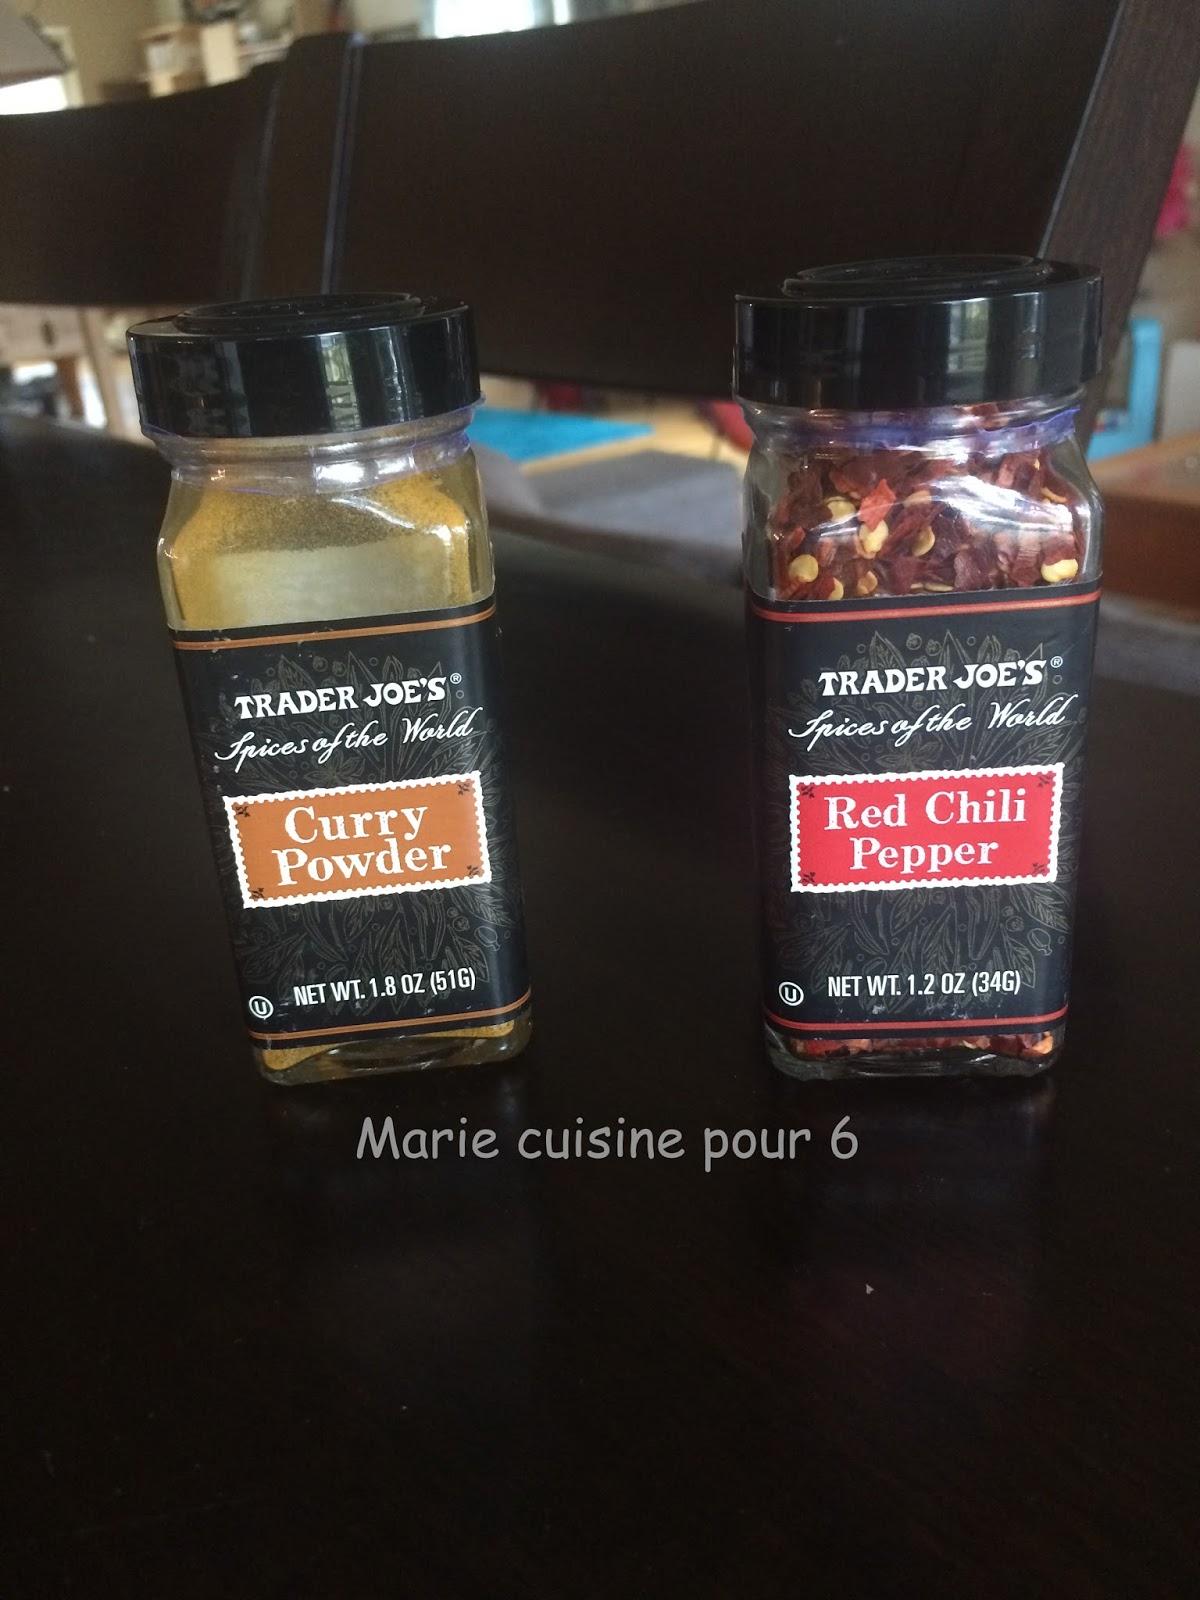 Marie cuisine pour 6 the unexpected come back - Cuisiner gambas surgelees ...